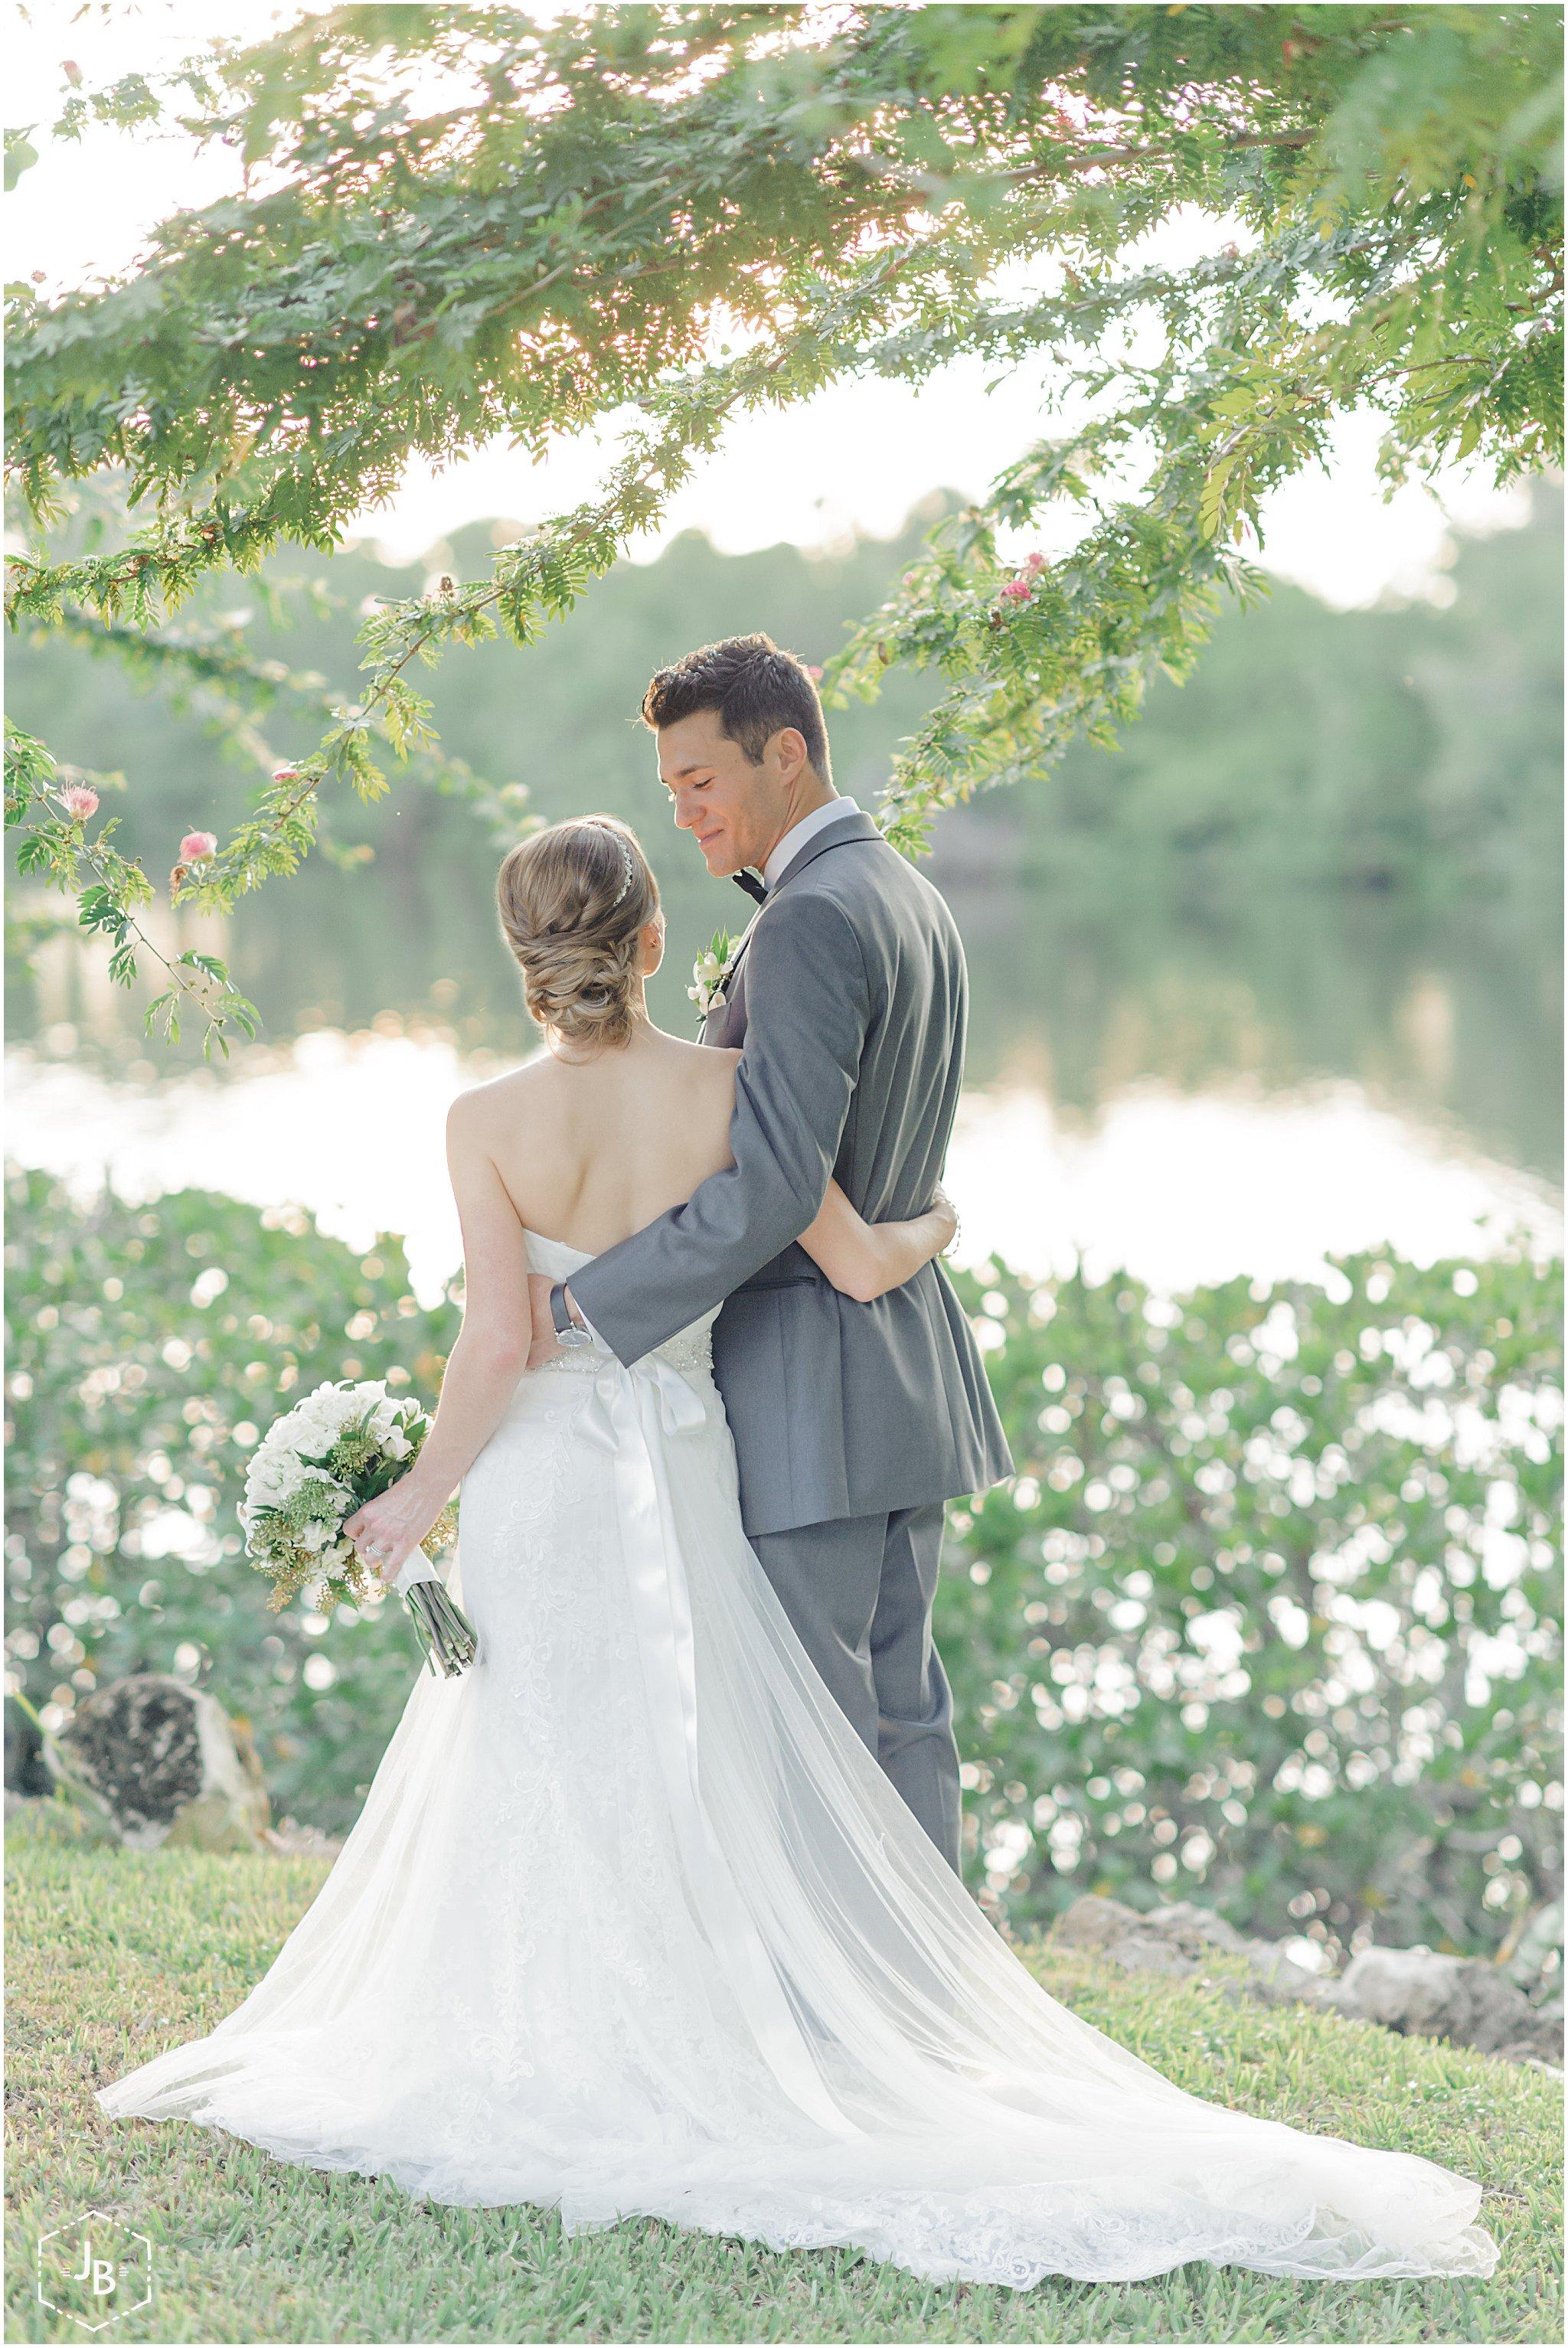 WeddingandEngagementFloridaPhotographer_0368.jpg